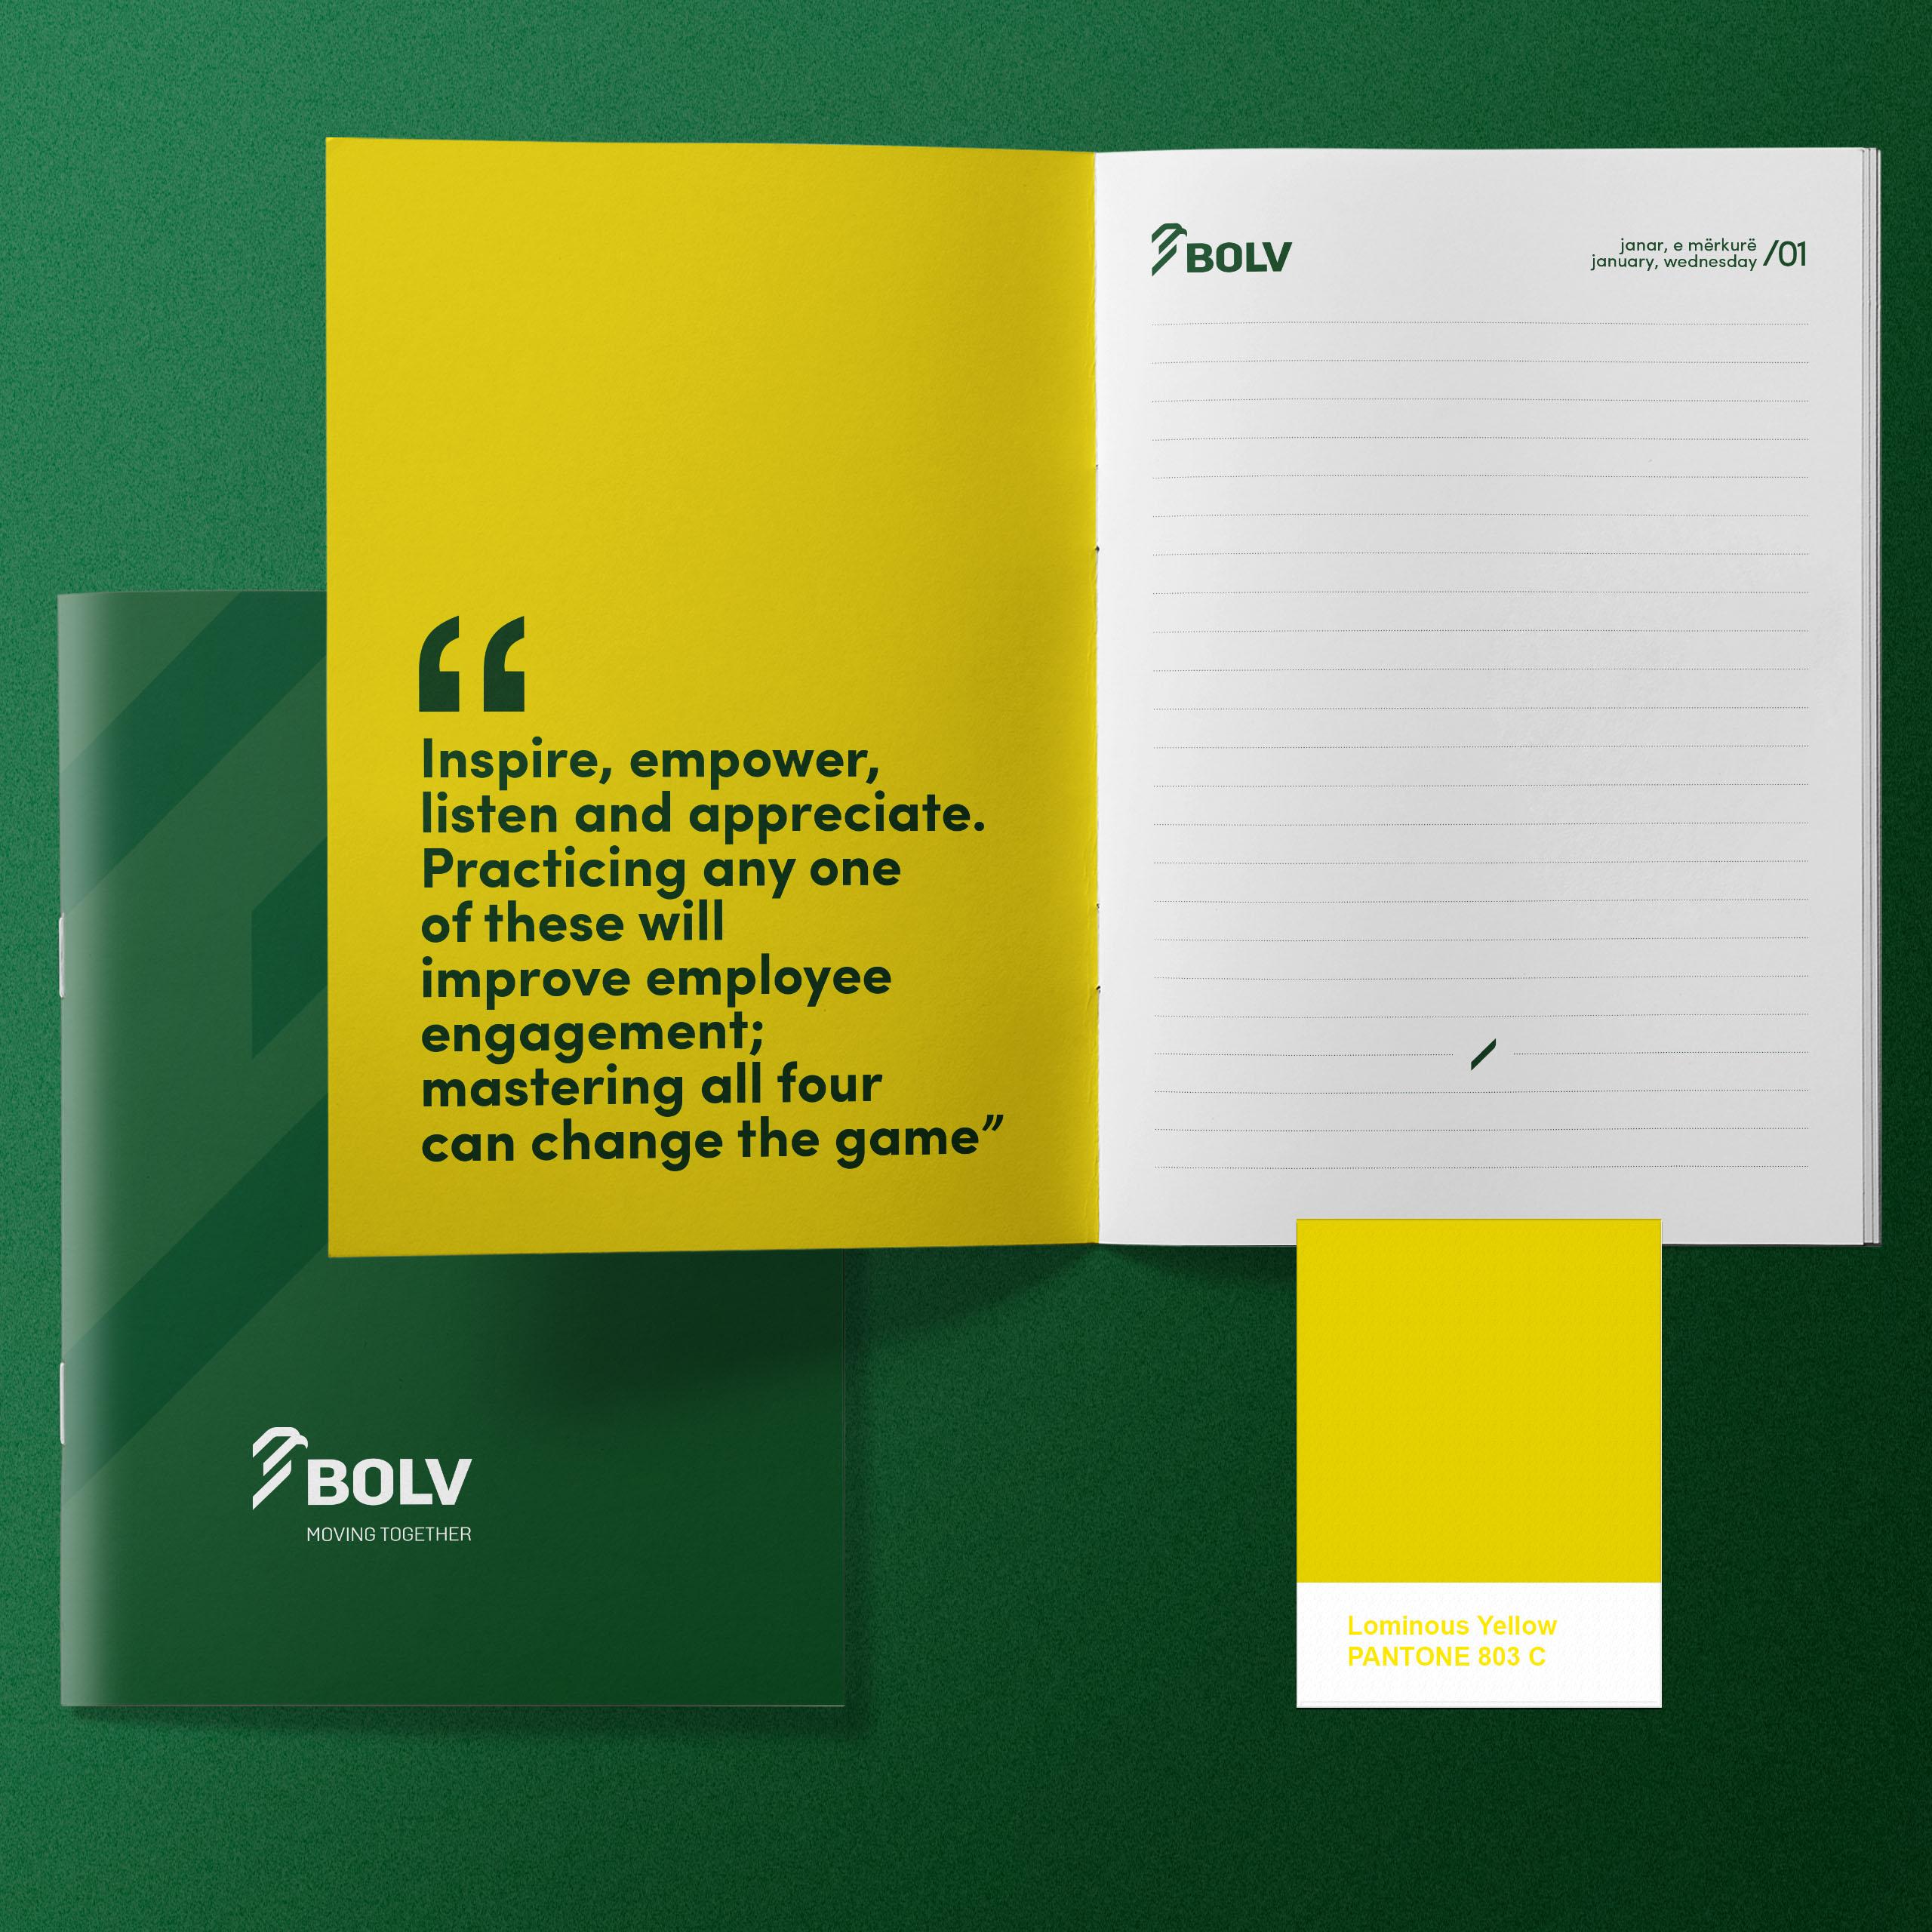 Bolv Project Img 3 - Vatra Agency / Founder & CEO Gerton Bejo